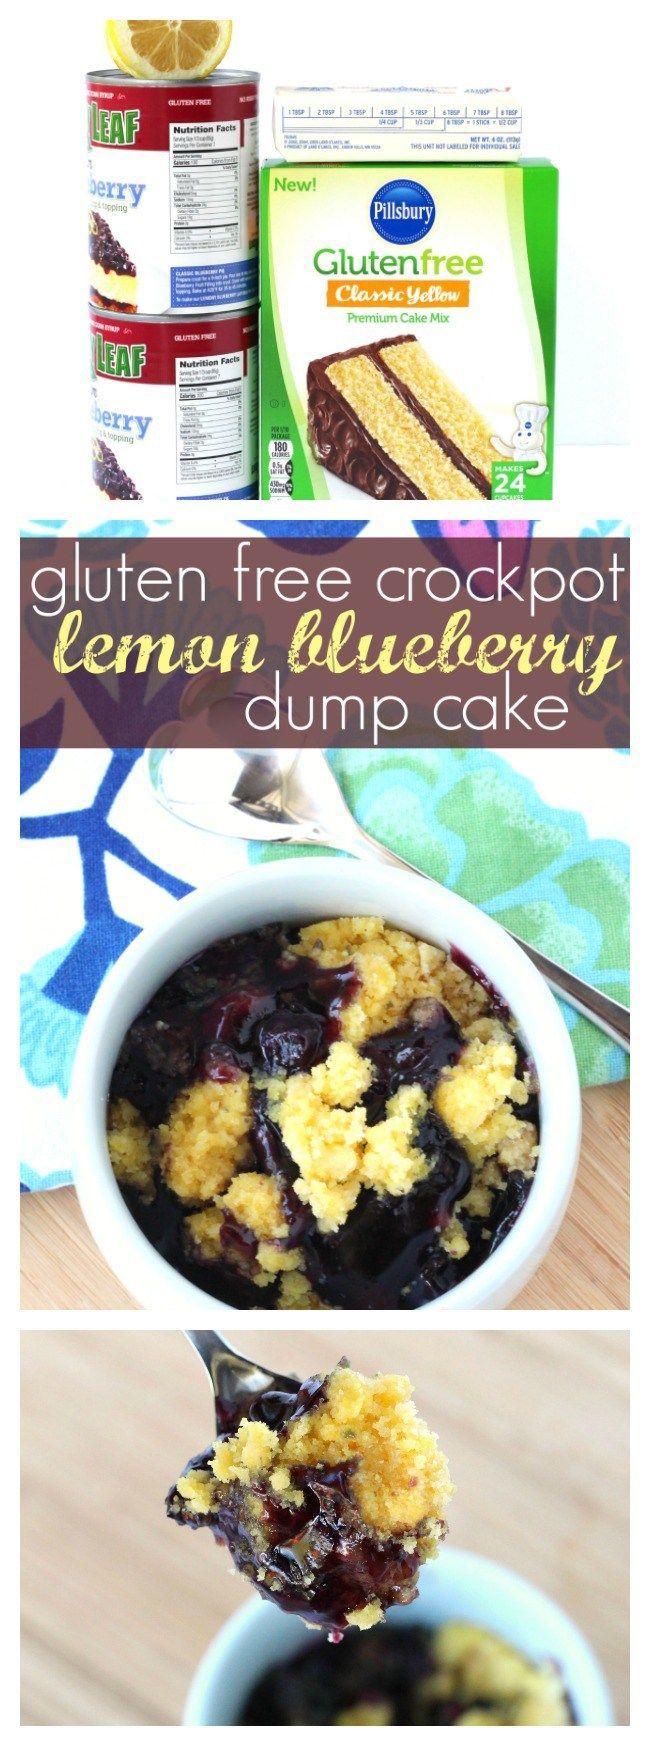 Gluten Free Crockpot Lemon Blueberry Dump Cake | A delicious gluten free slow cooker dessert, made in minutes! #ad